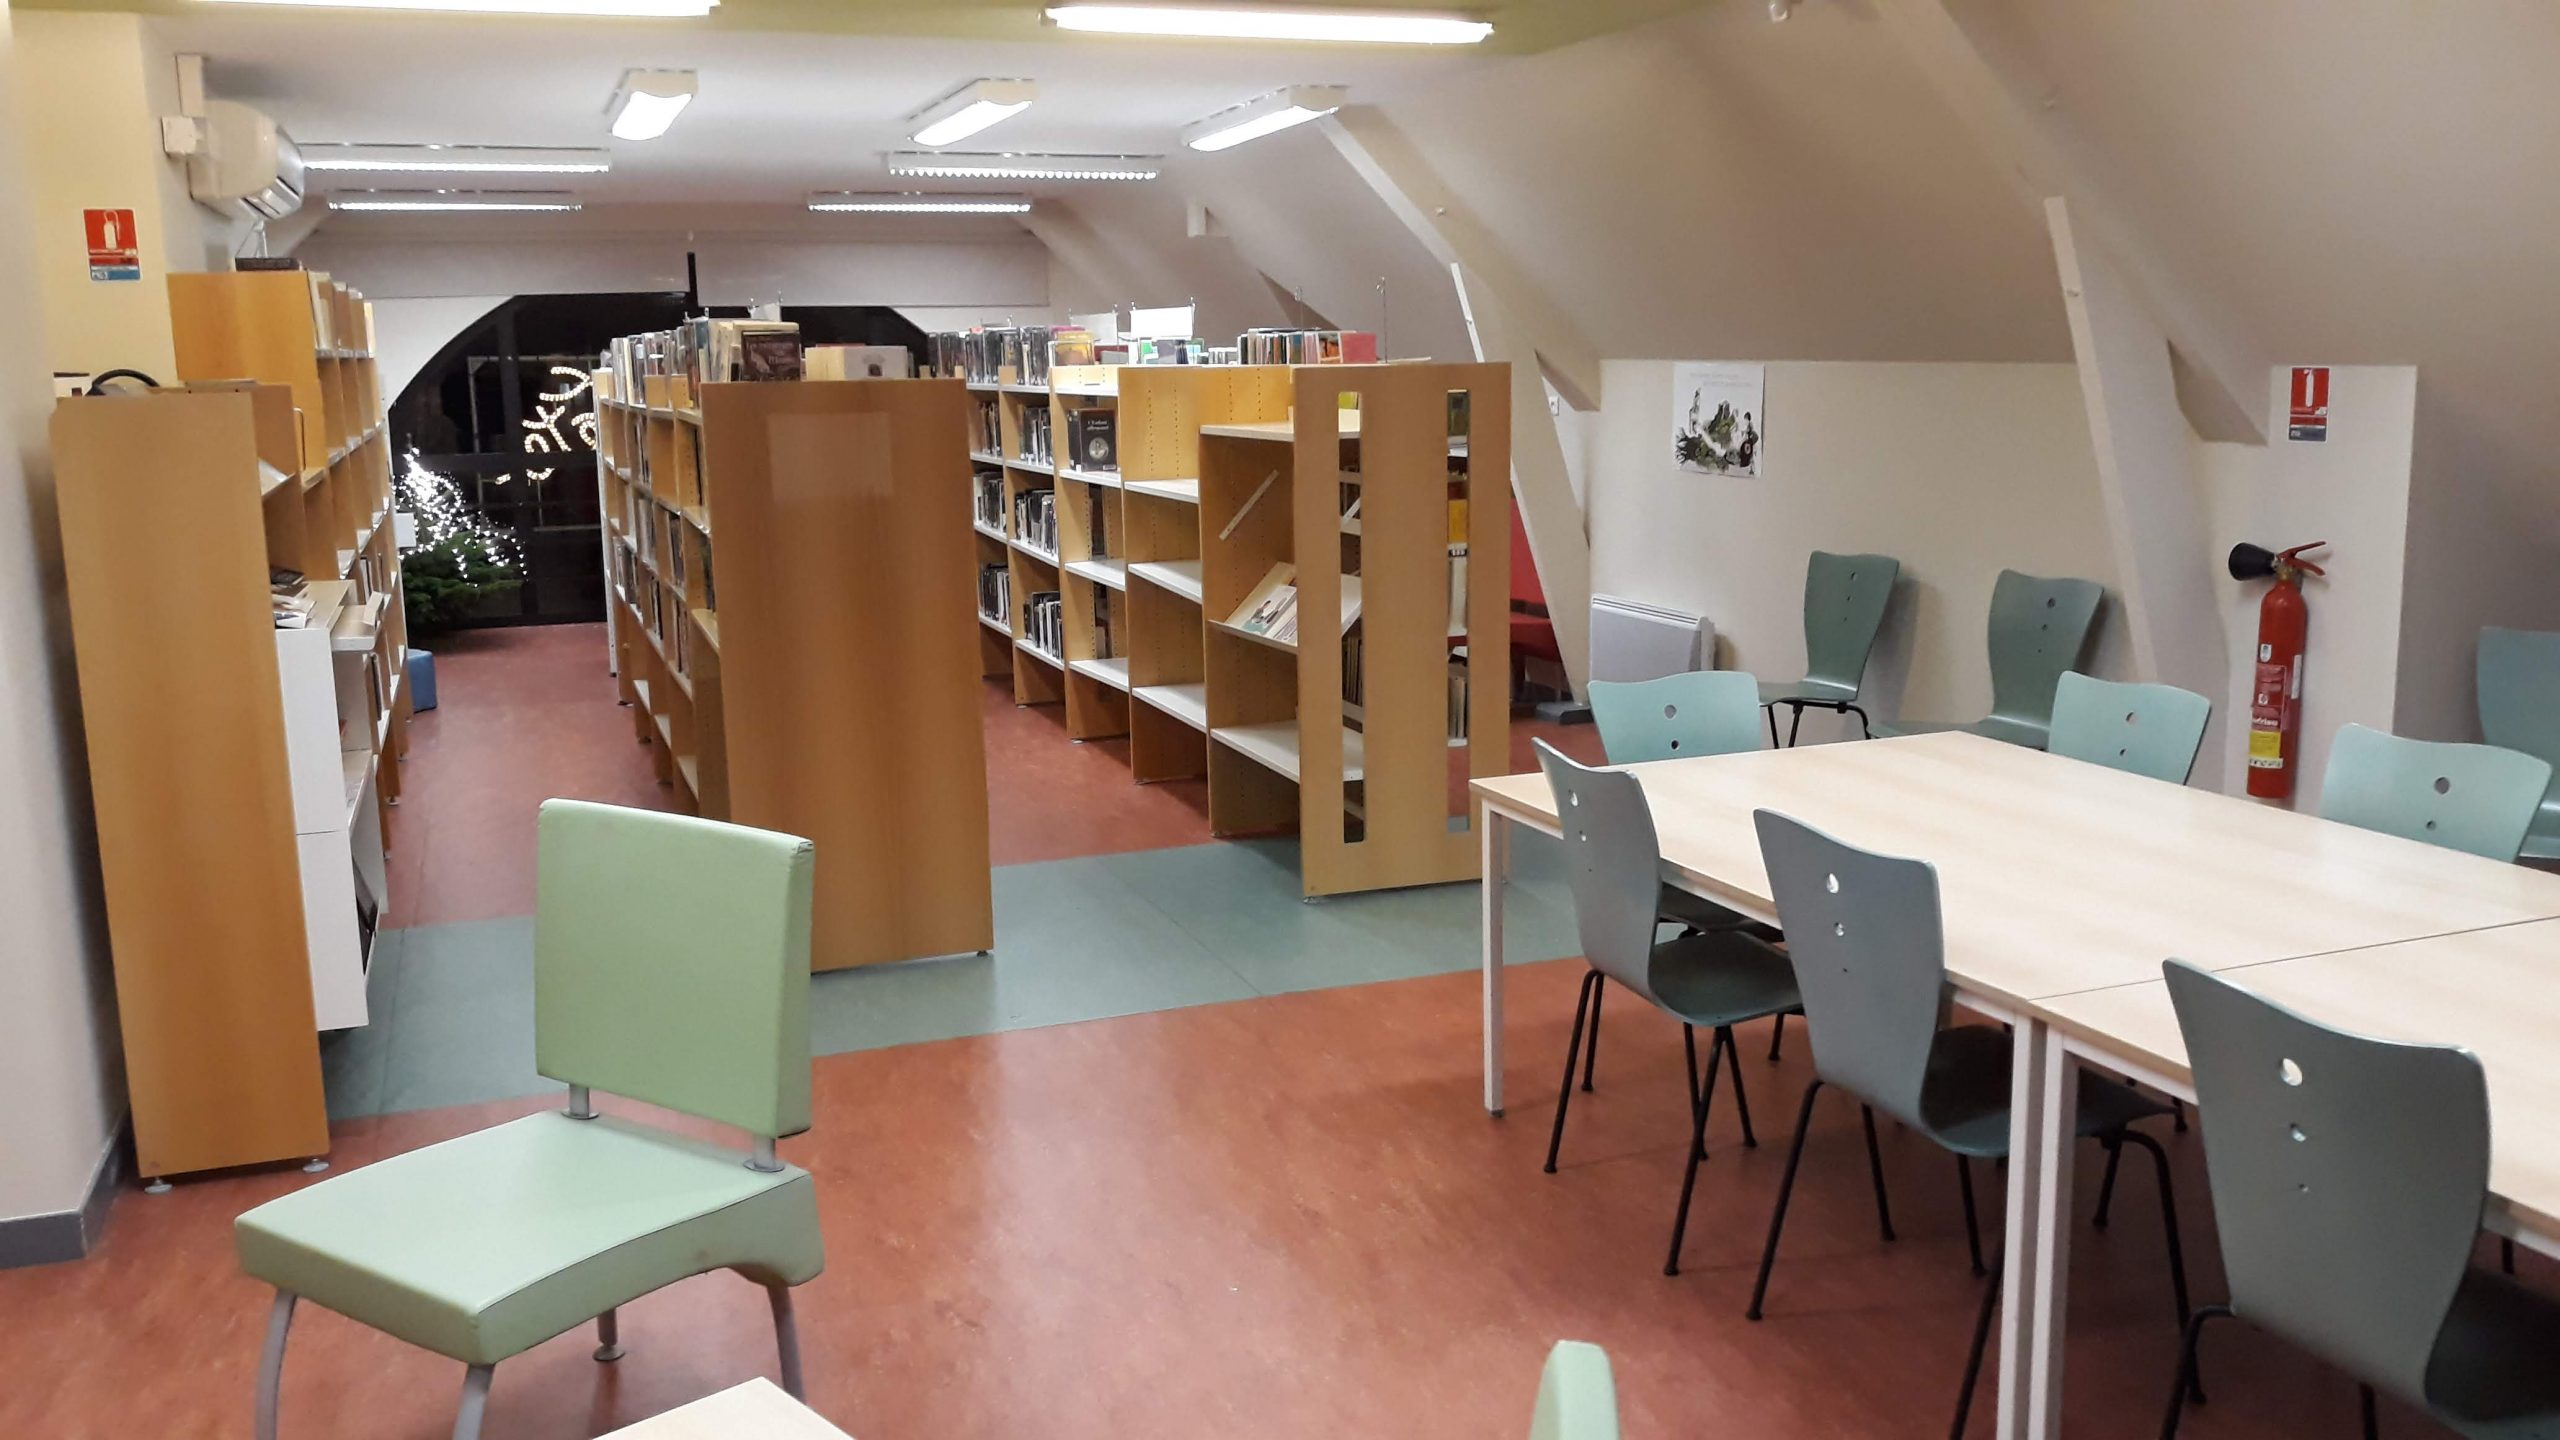 Fermeture estivale de la bibliothèque